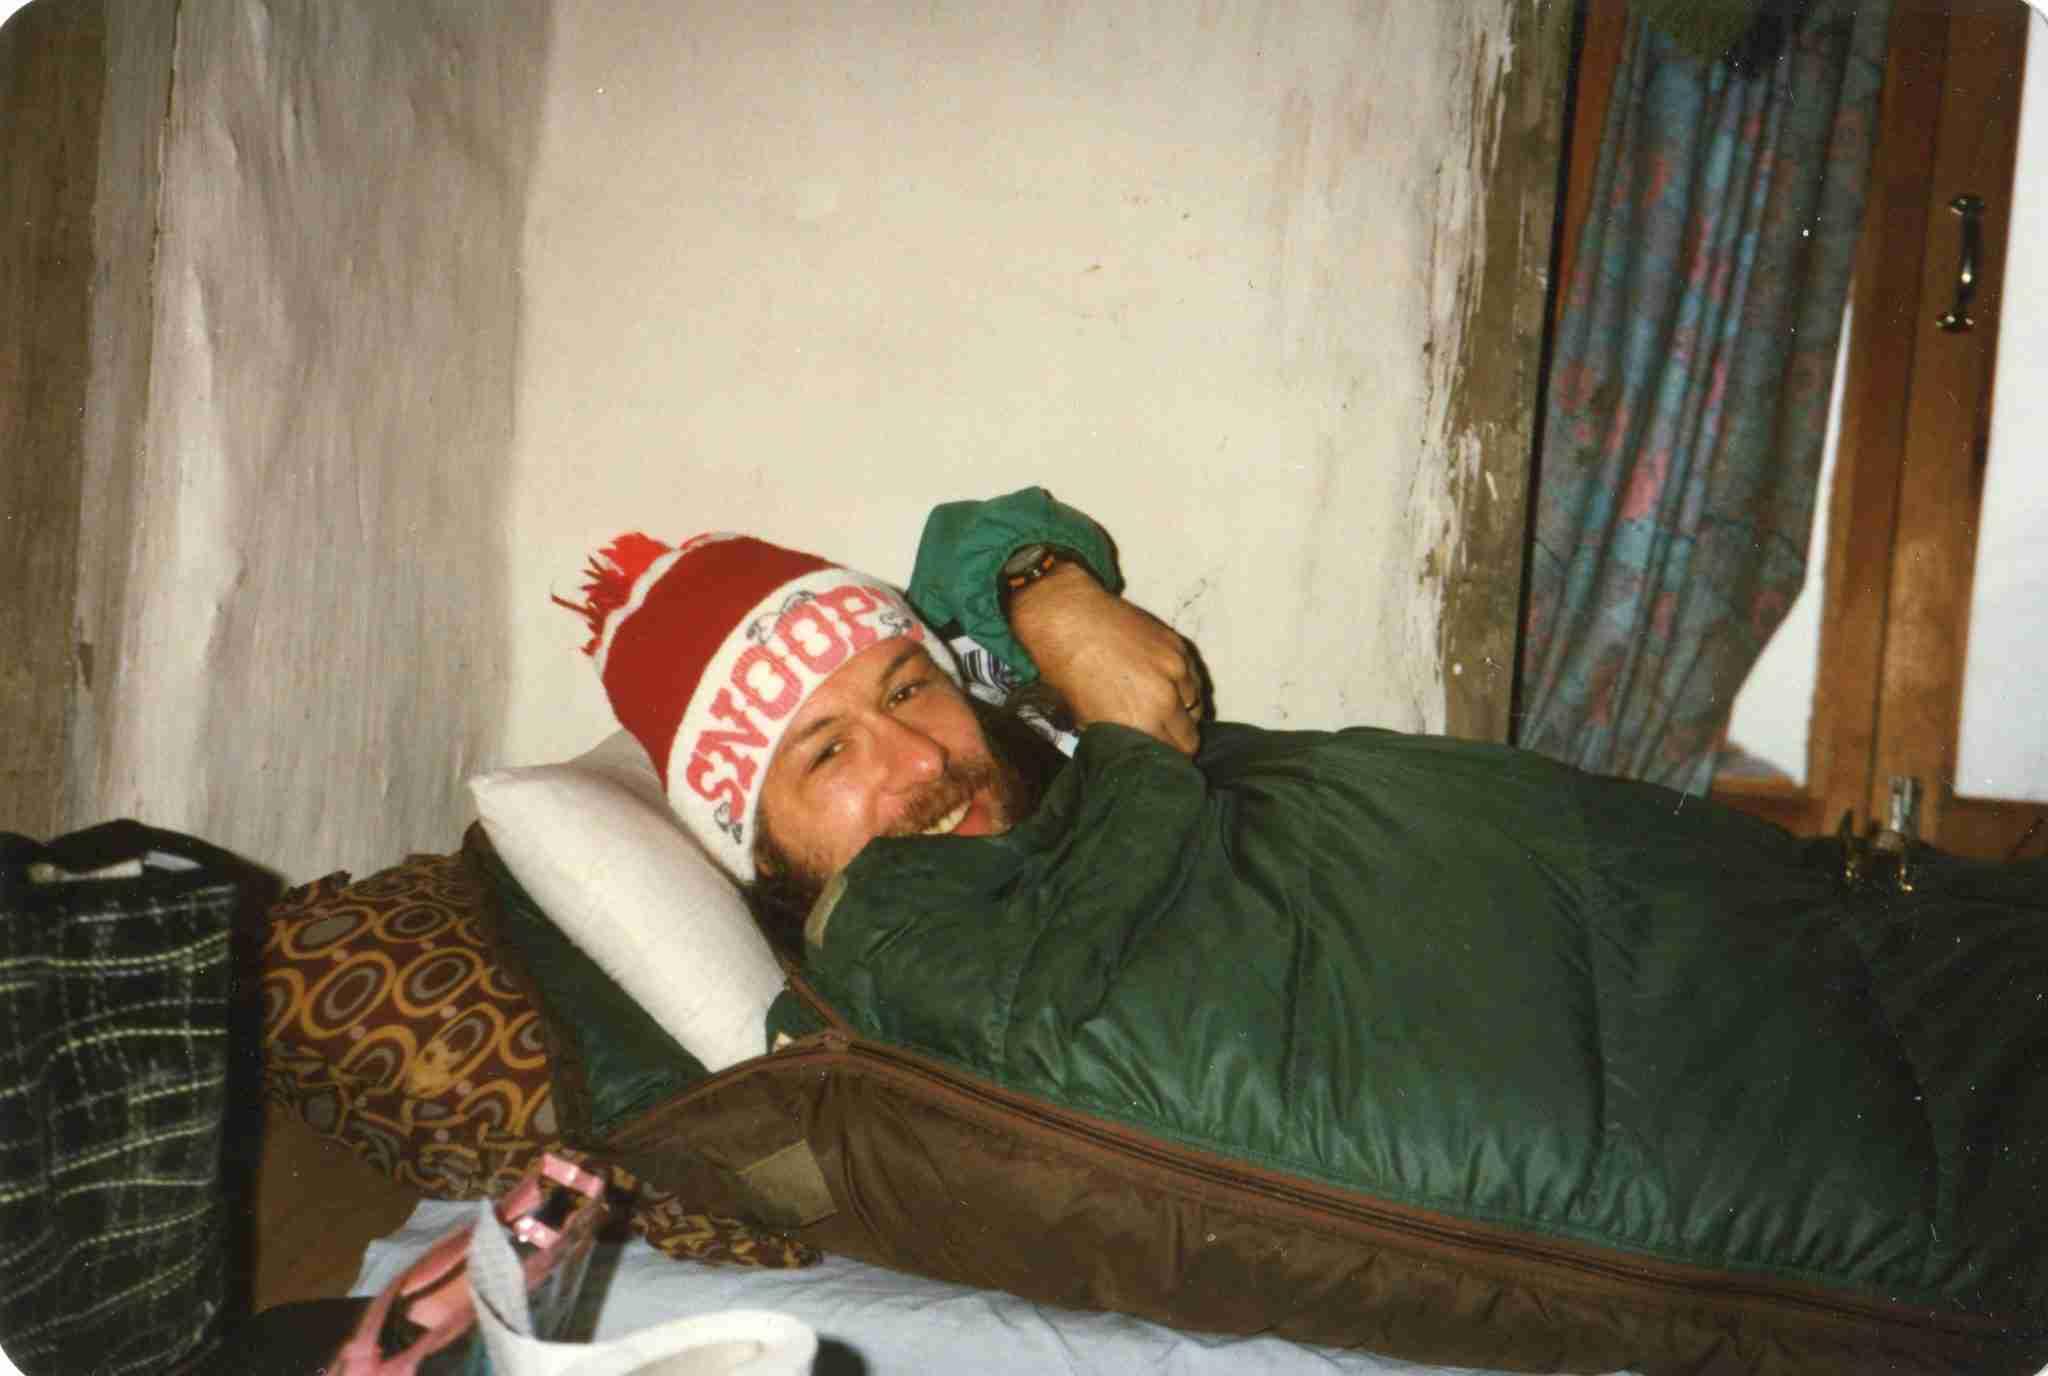 John with cap in sleeping bag